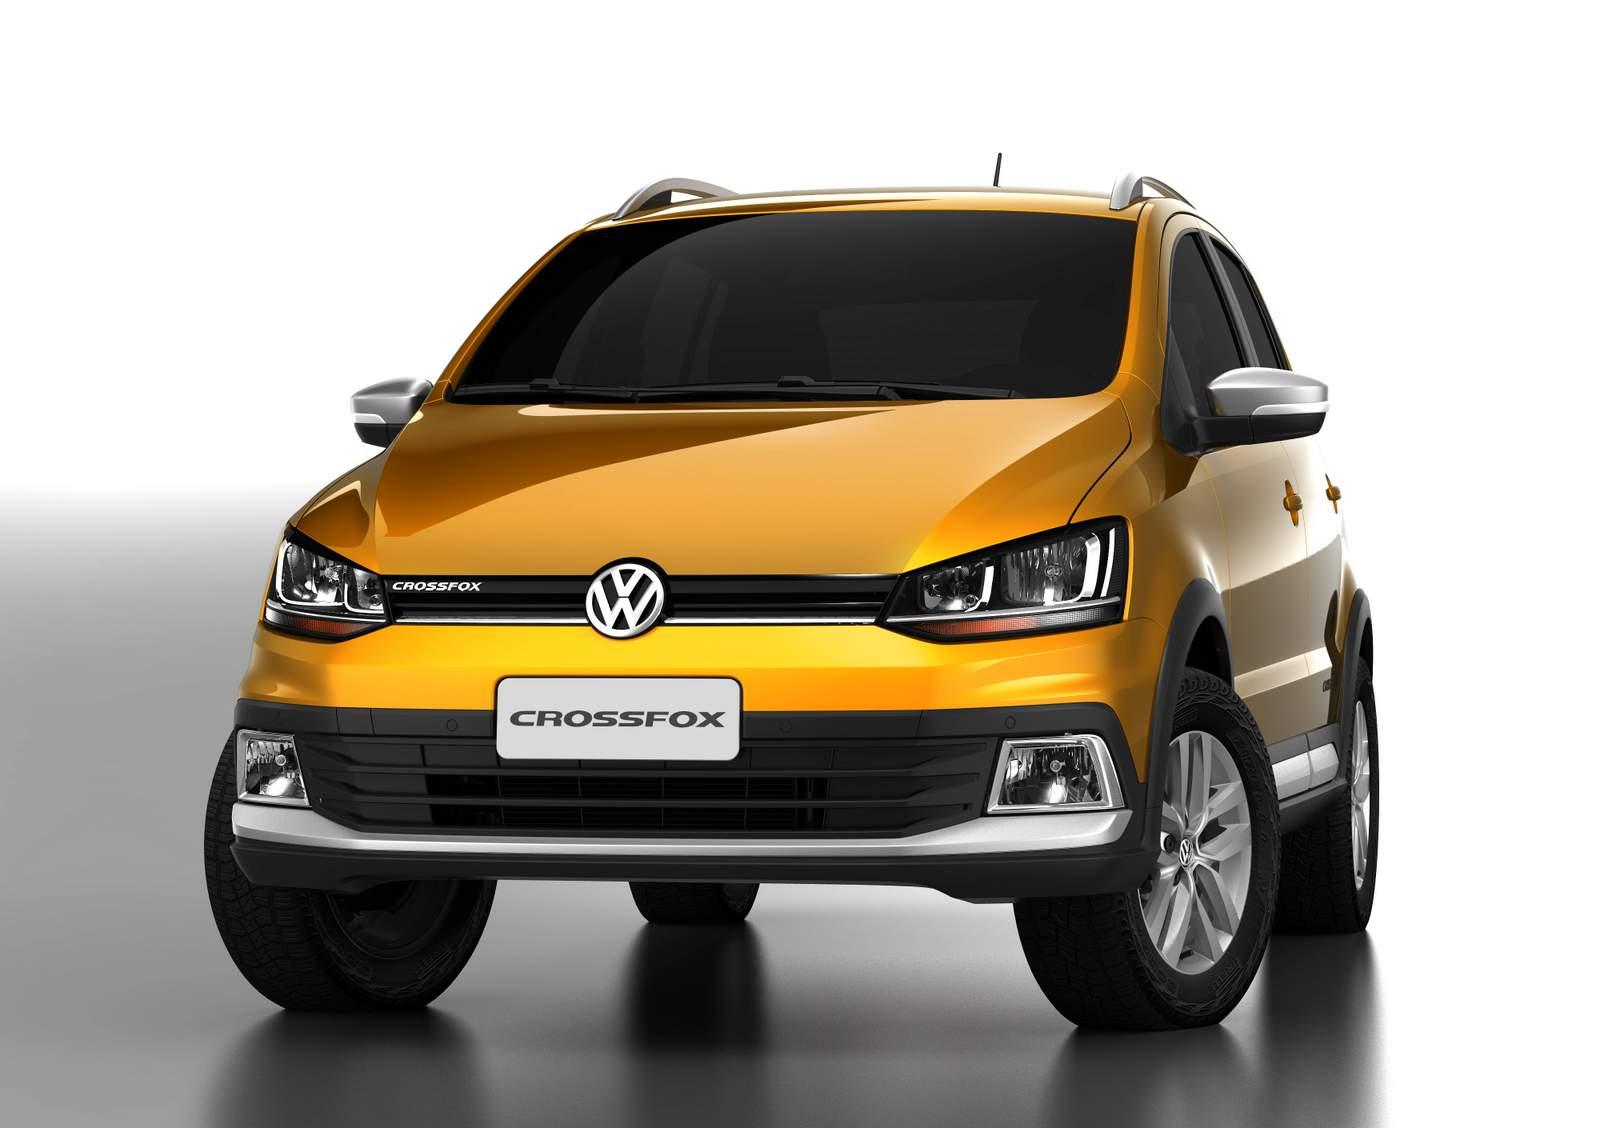 2015 VW CrossFox new color